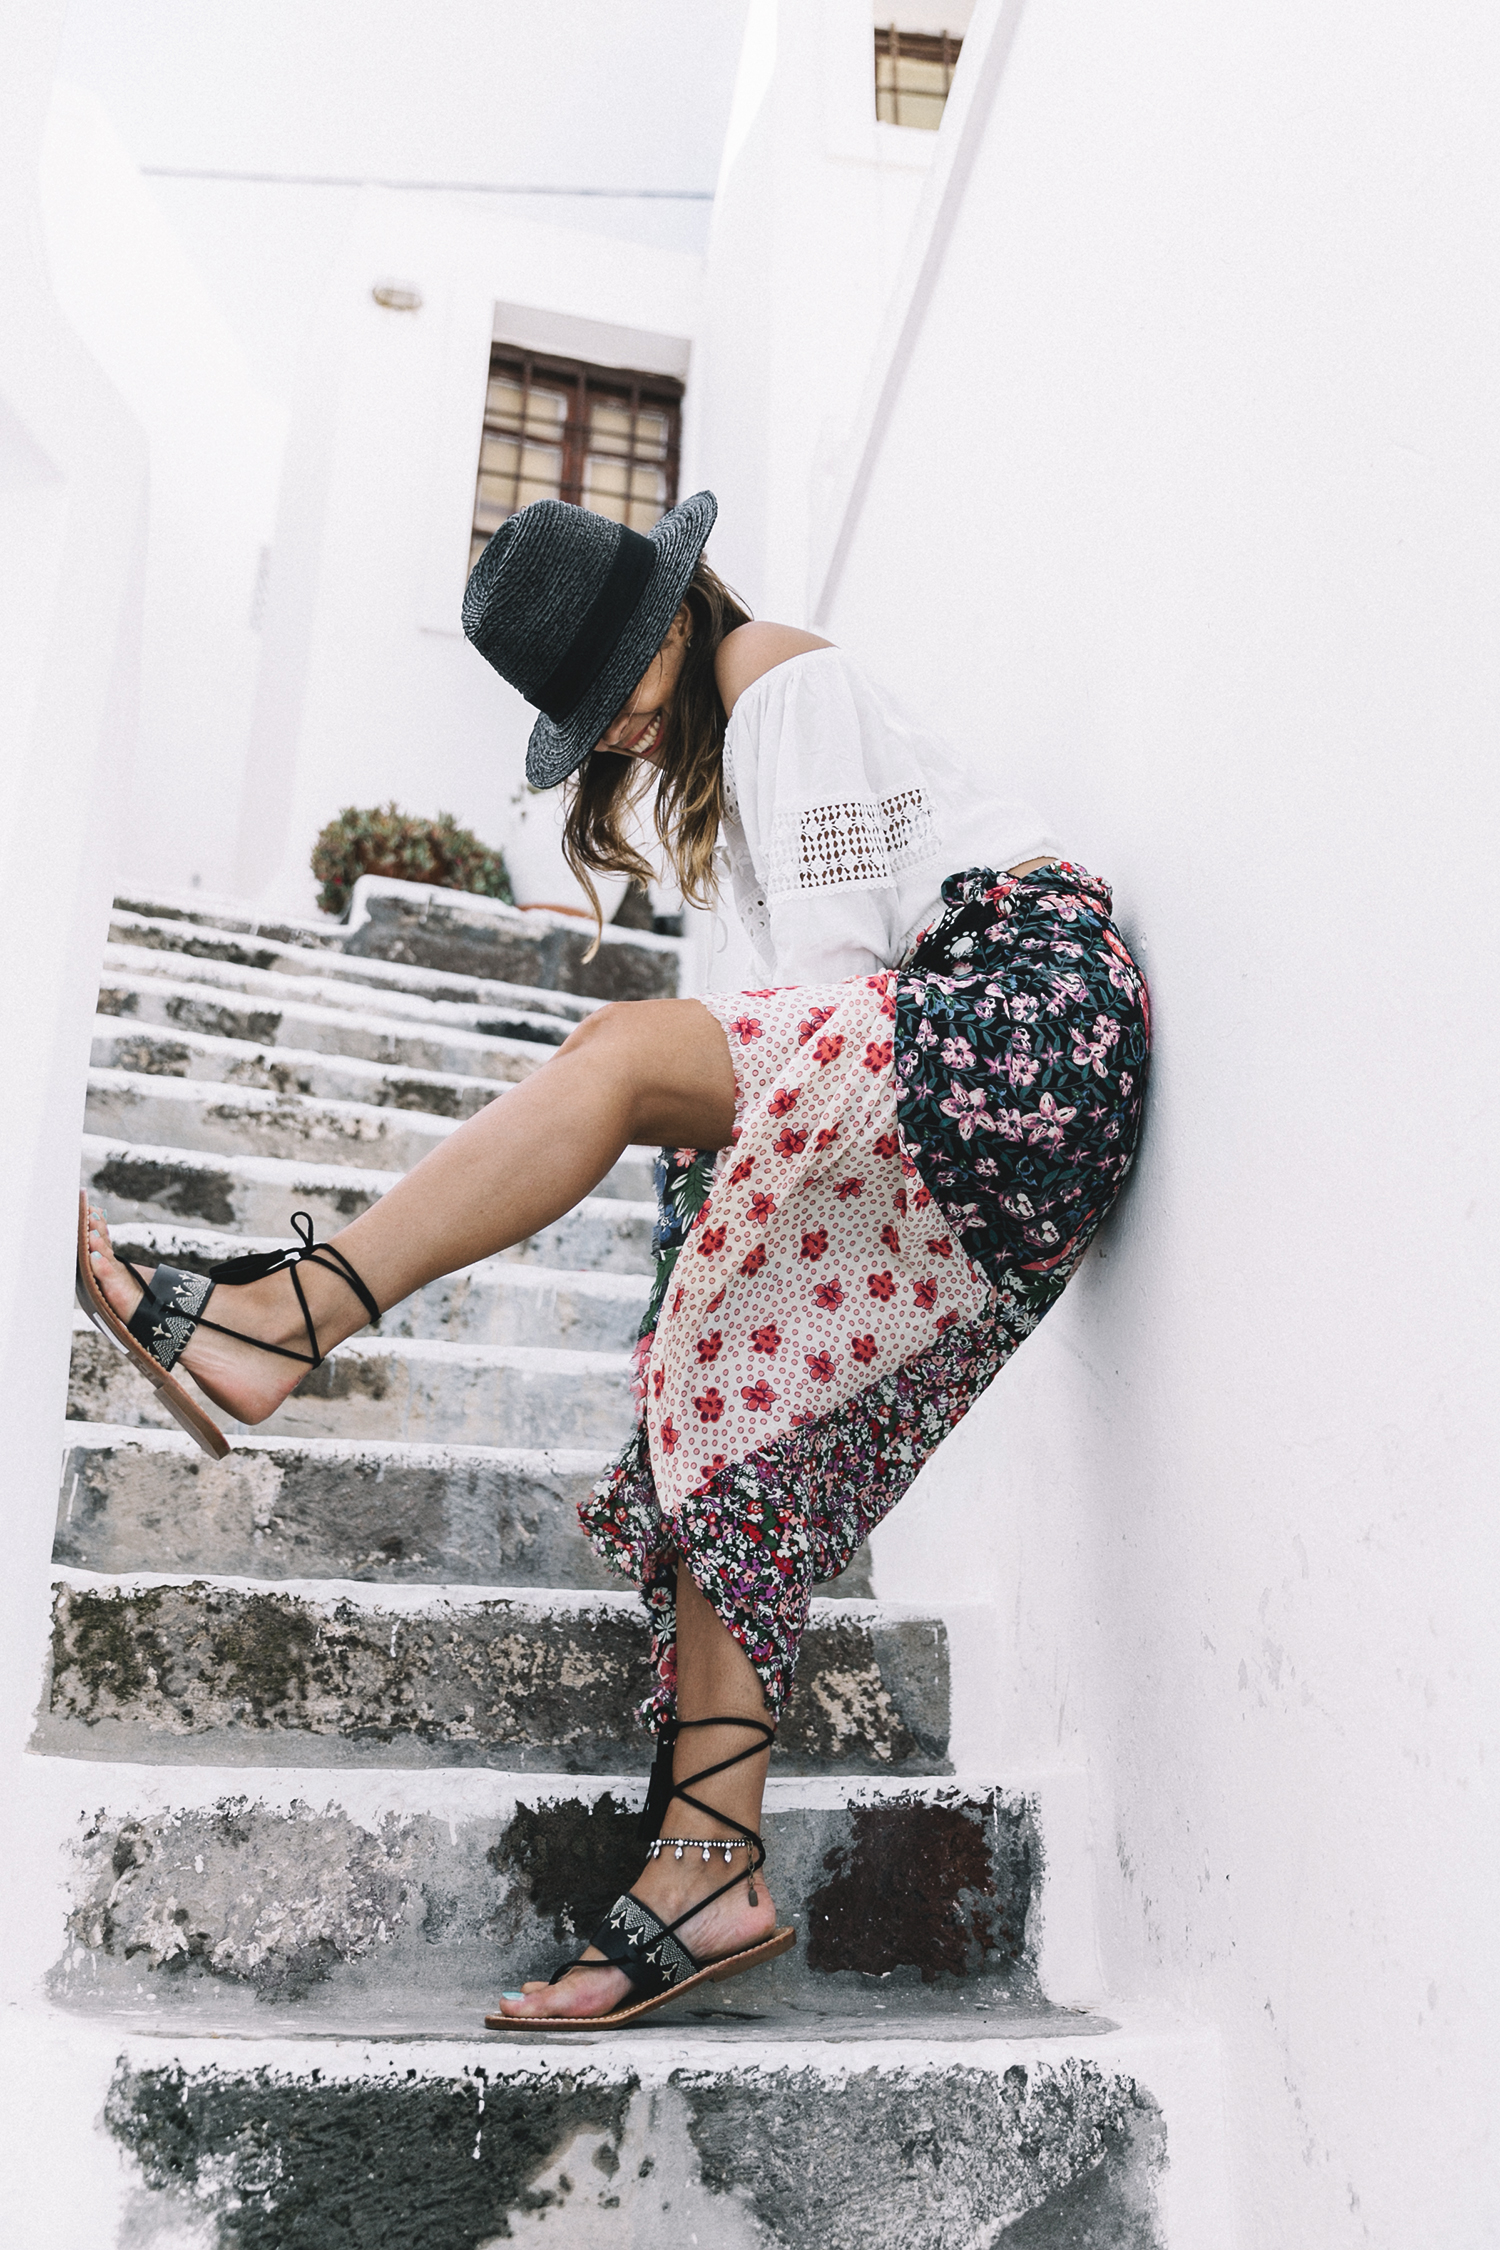 Scarf_As_Skirt_Boho_Top-Straw_Hat-Soludos_Escapes-Soludos_Espadrilles-Summer-Santorini-Collage_Vintage-14